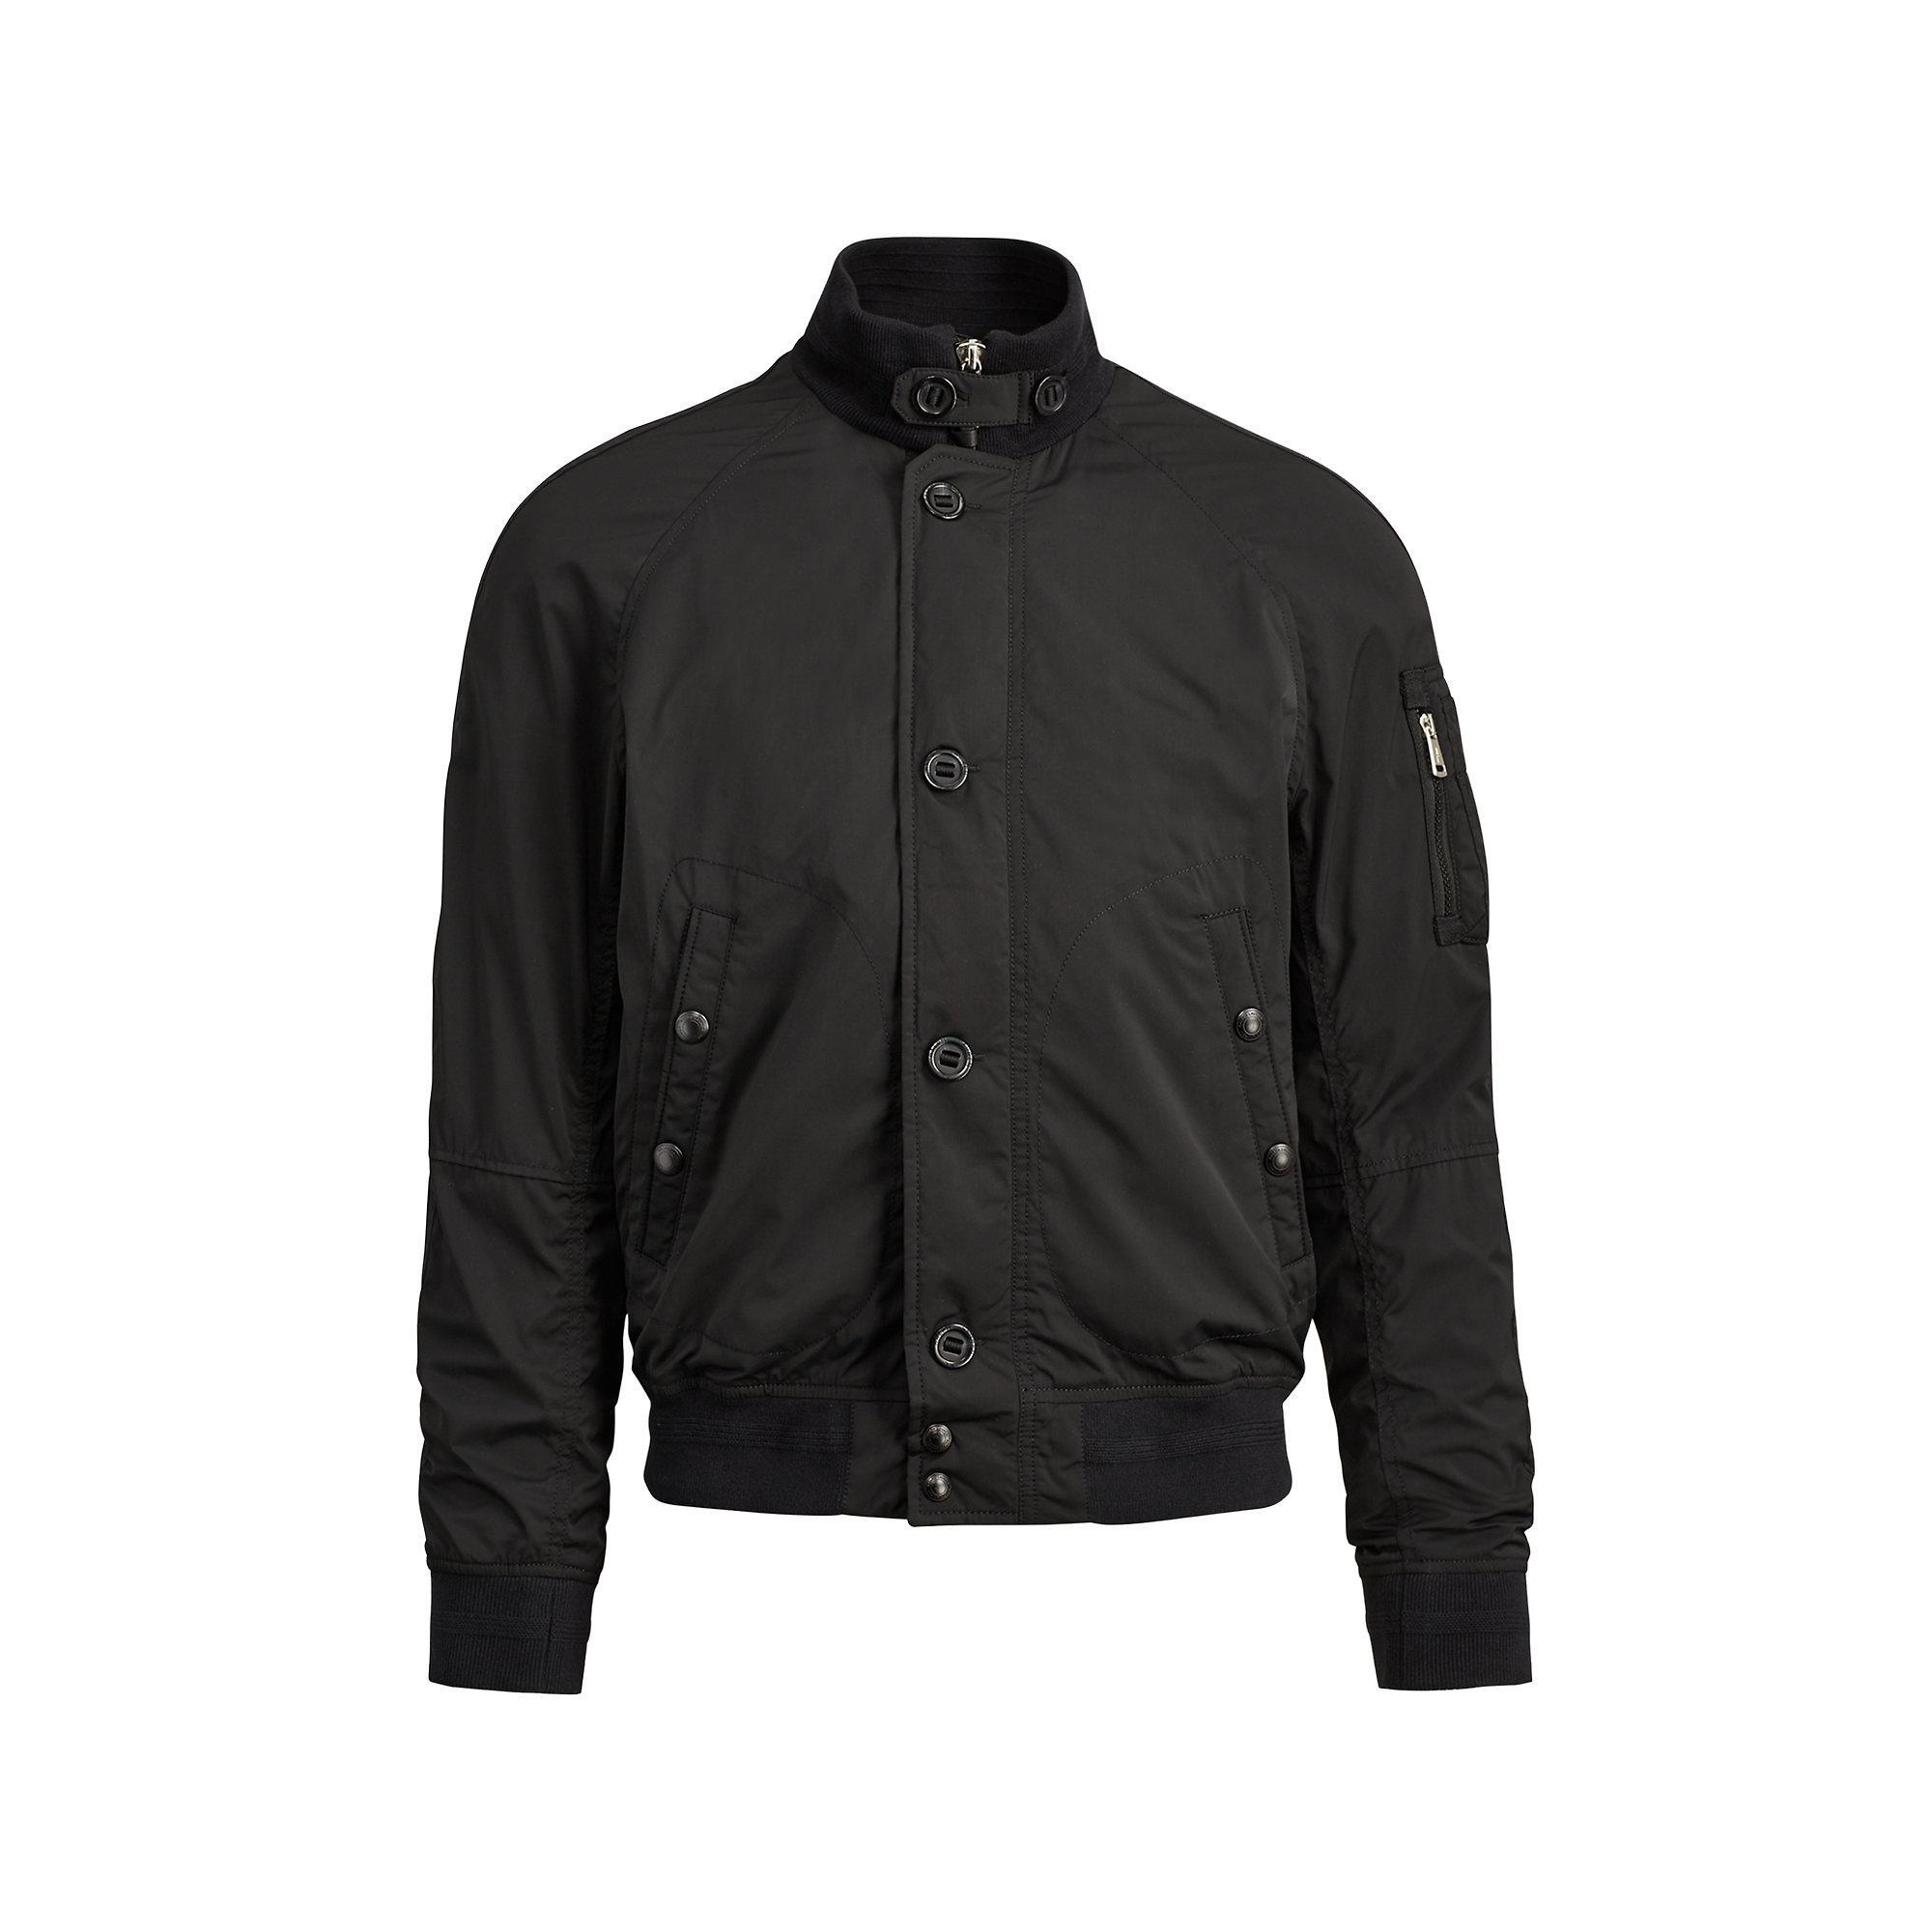 polo ralph lauren lightweight bomber jacket in black for. Black Bedroom Furniture Sets. Home Design Ideas